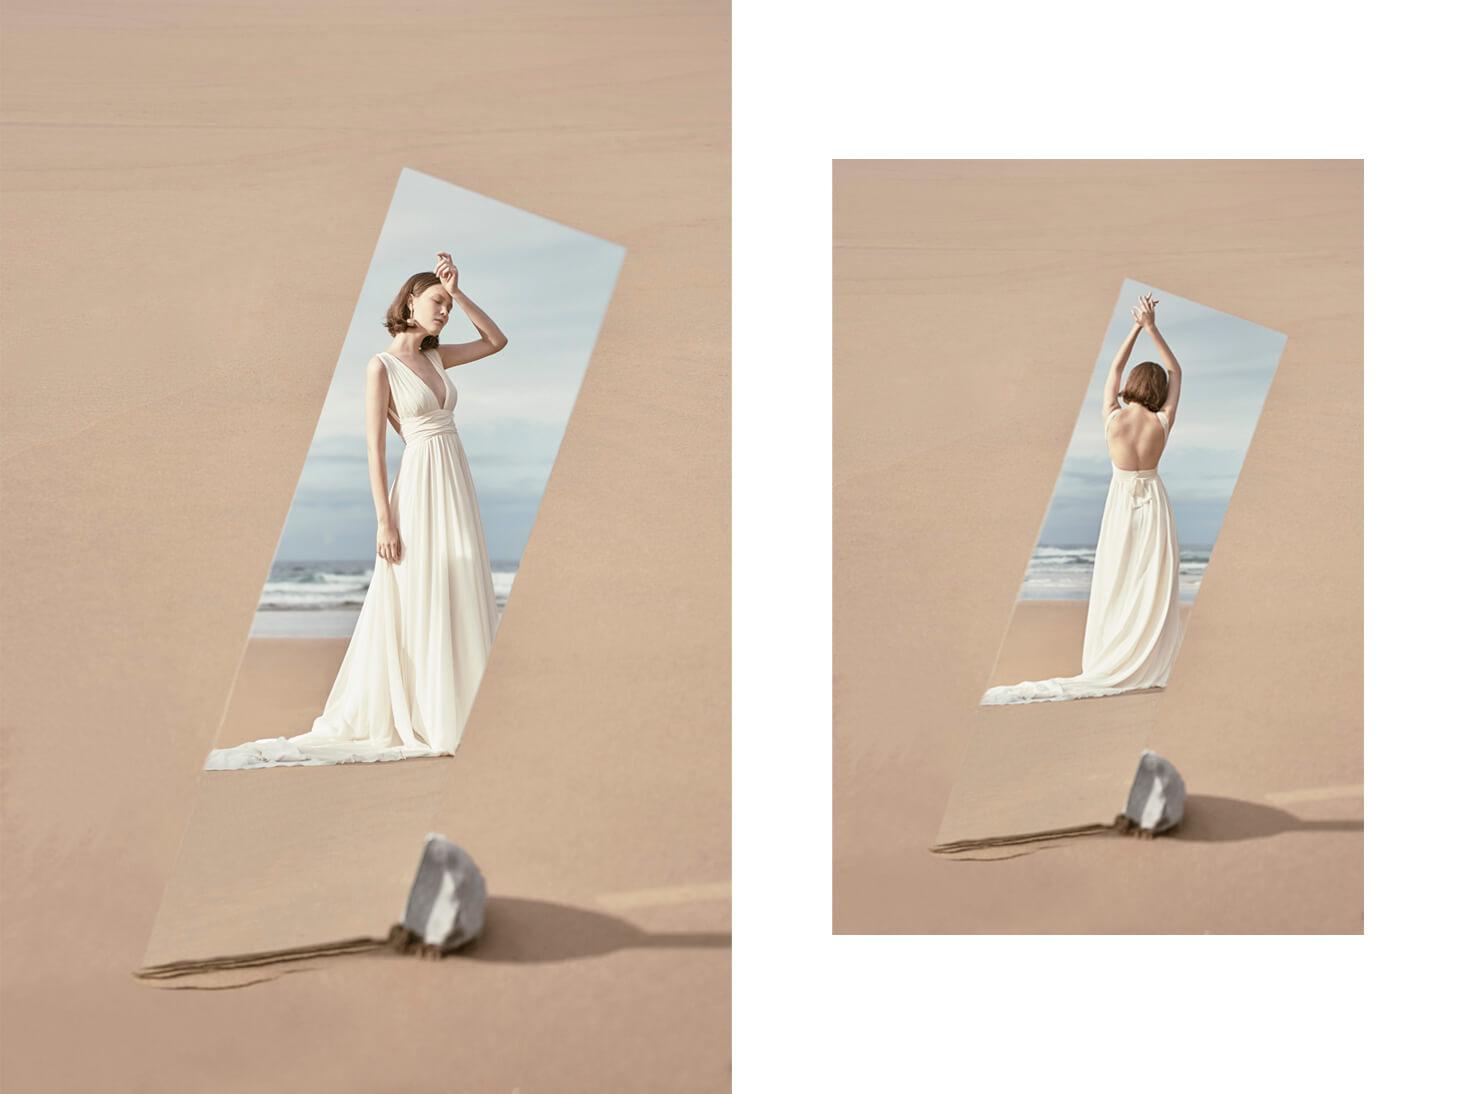 Monica-Cordera-Bridal-novia-2018-vestido-blanco-drapeado-escote-espalda